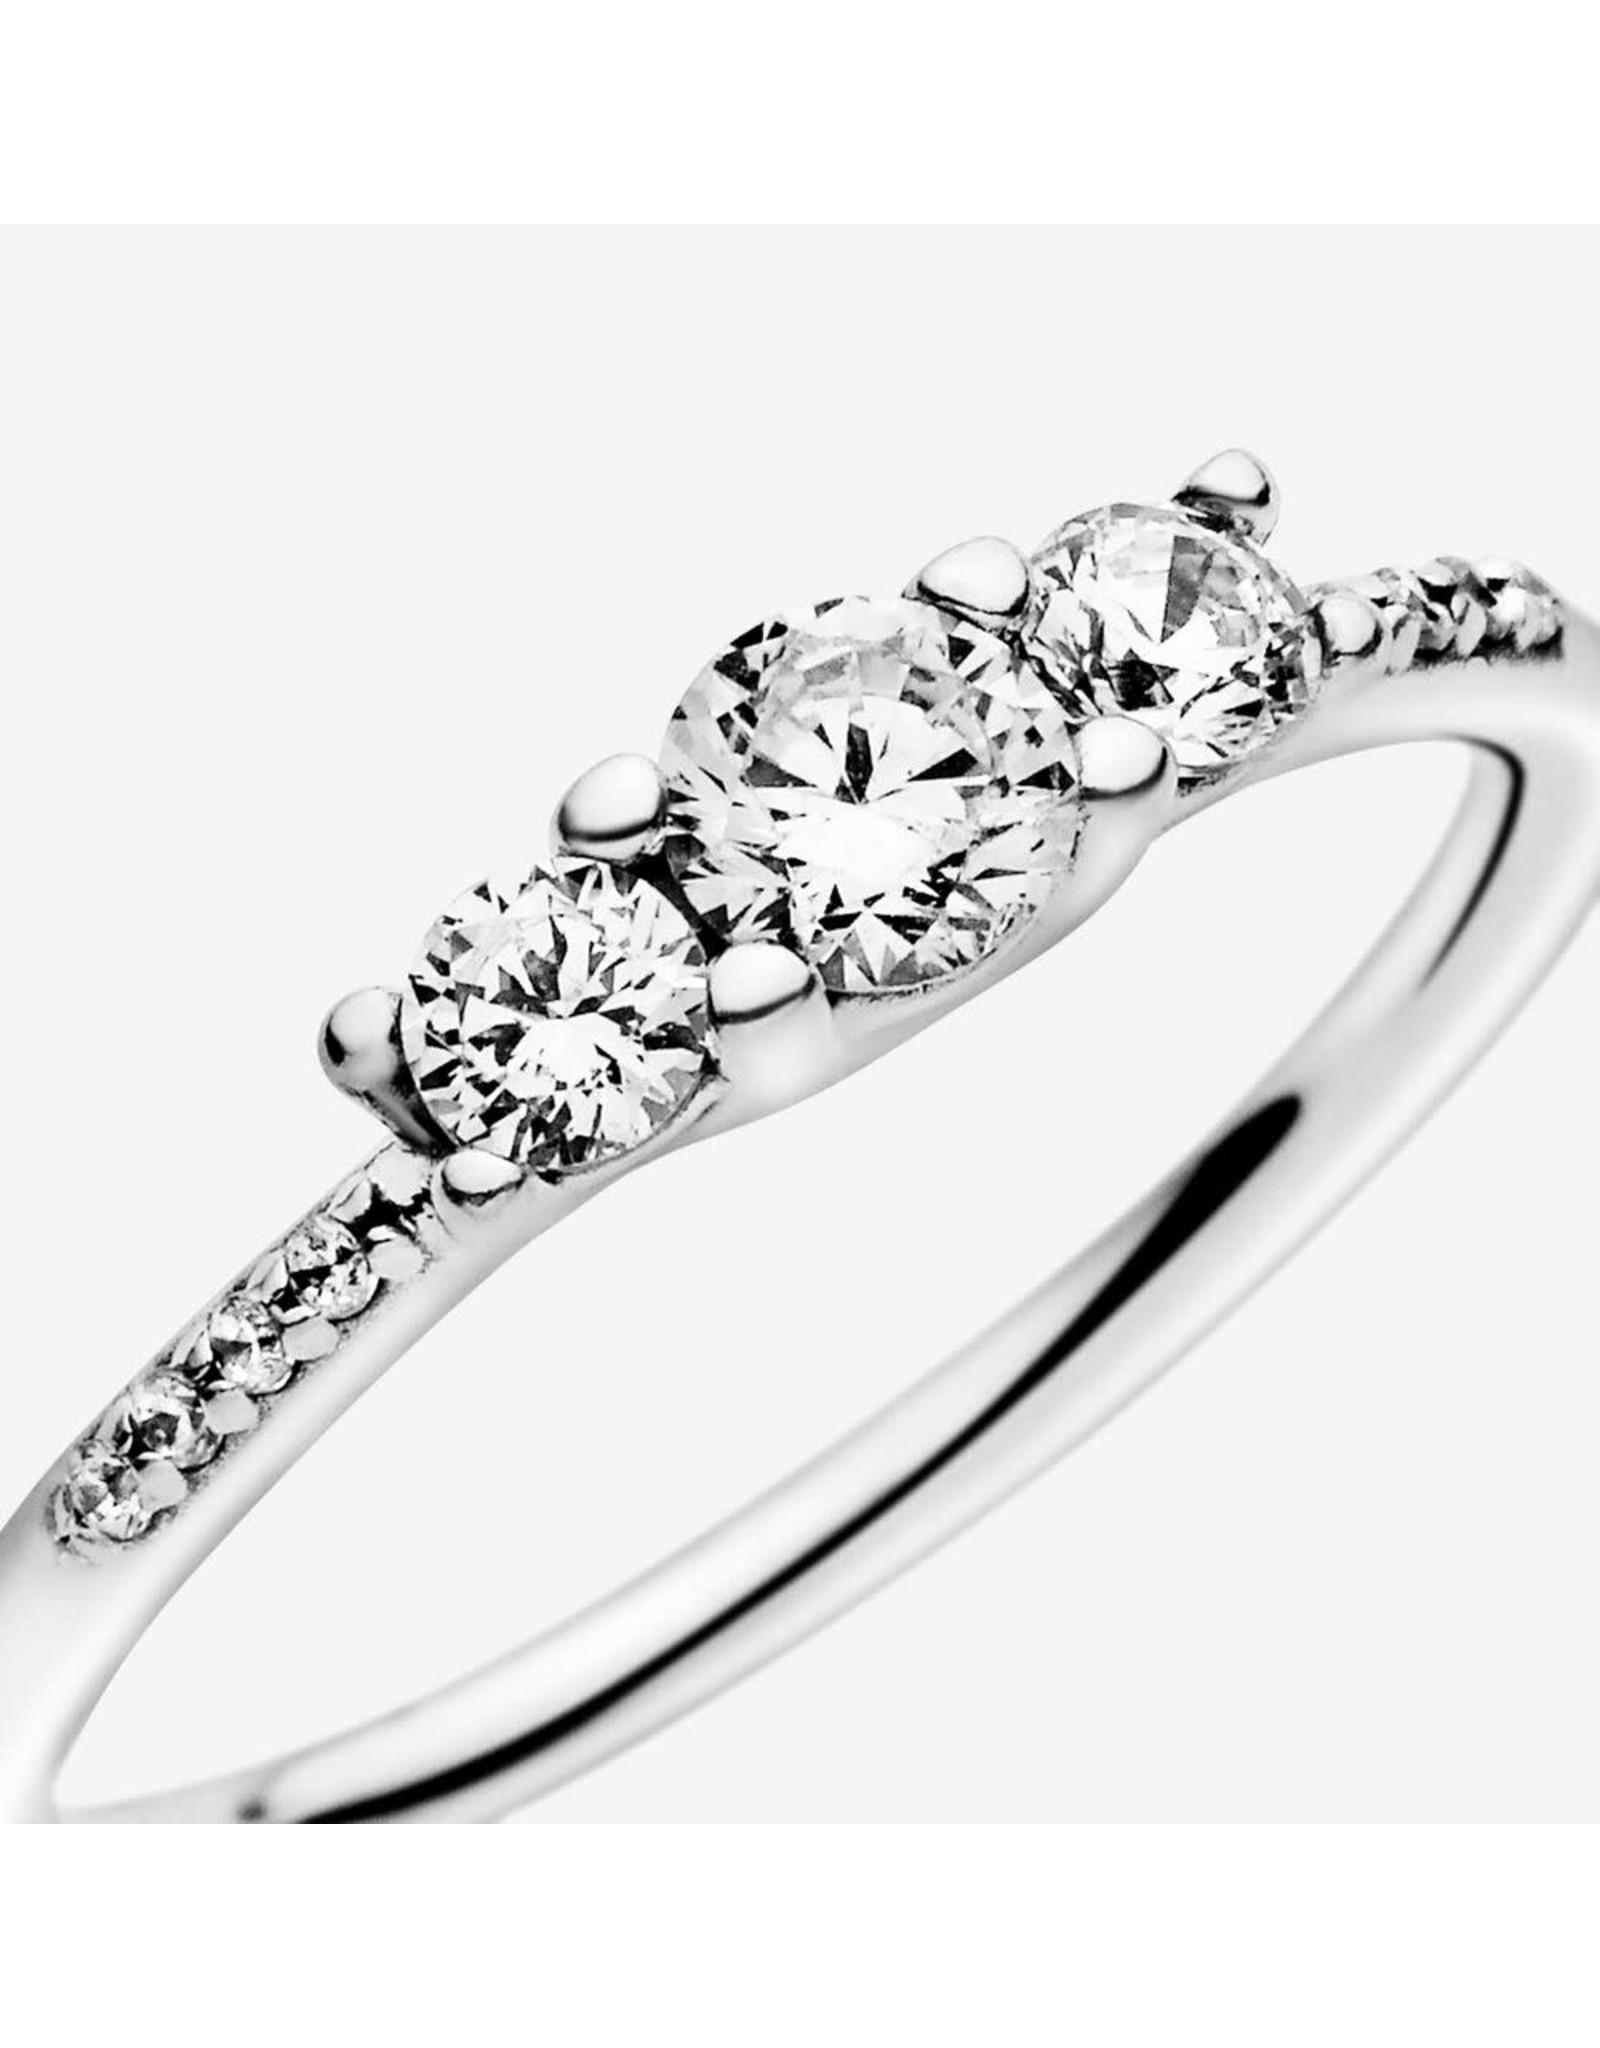 Pandora Pandora Ring,(196242CZ) Fairytale Sparkle, Clear CZ